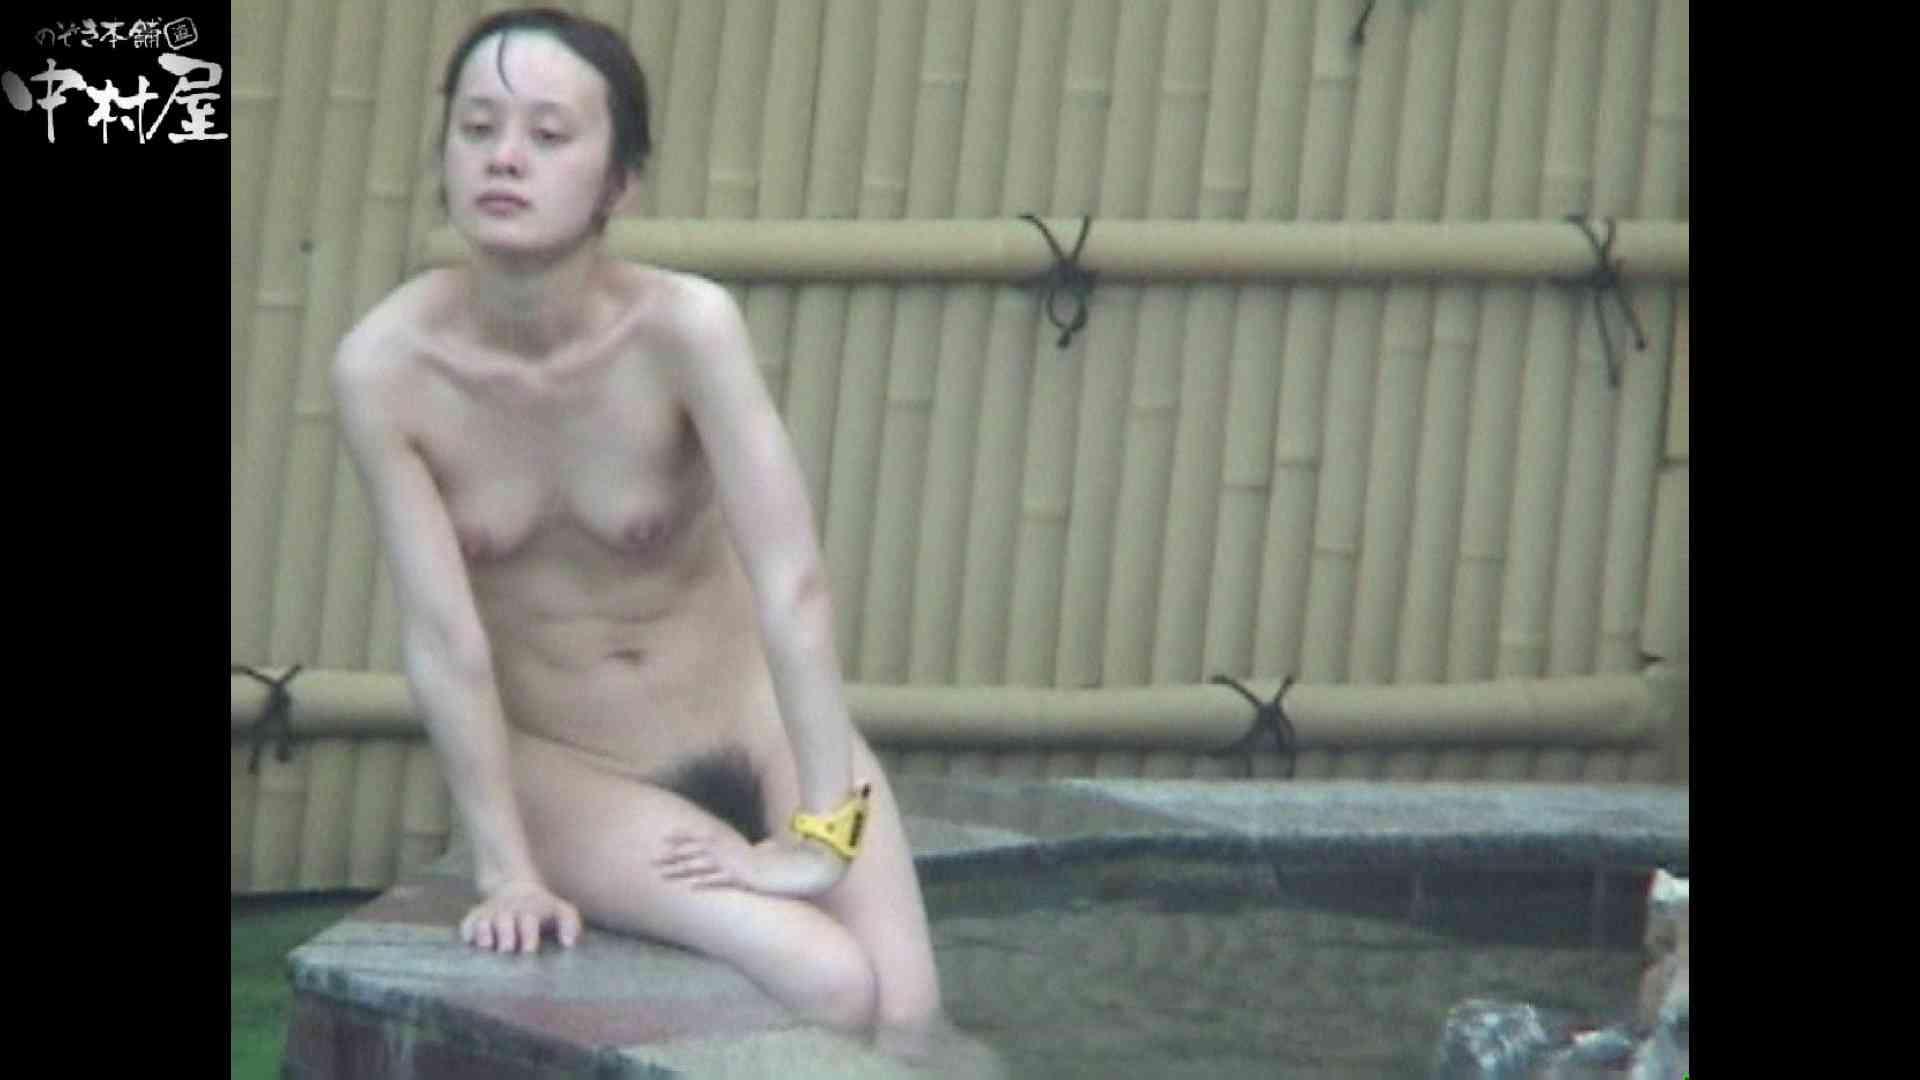 Aquaな露天風呂Vol.973 盗撮師作品  95pic 90